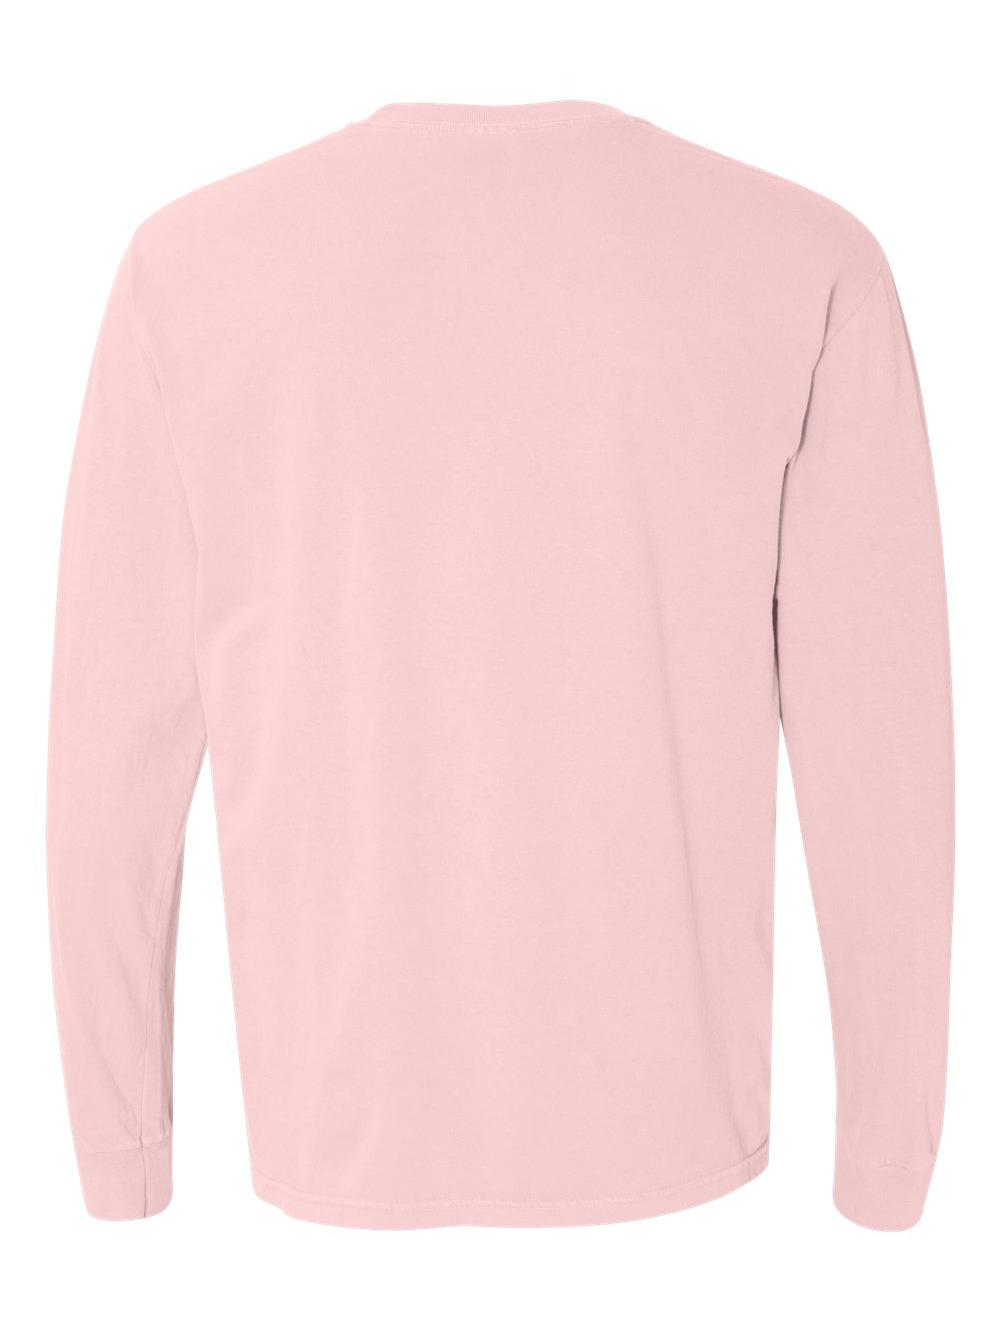 Comfort-Colors-Garment-Dyed-Heavyweight-Ringspun-Long-Sleeve-T-Shirt-6014 thumbnail 10